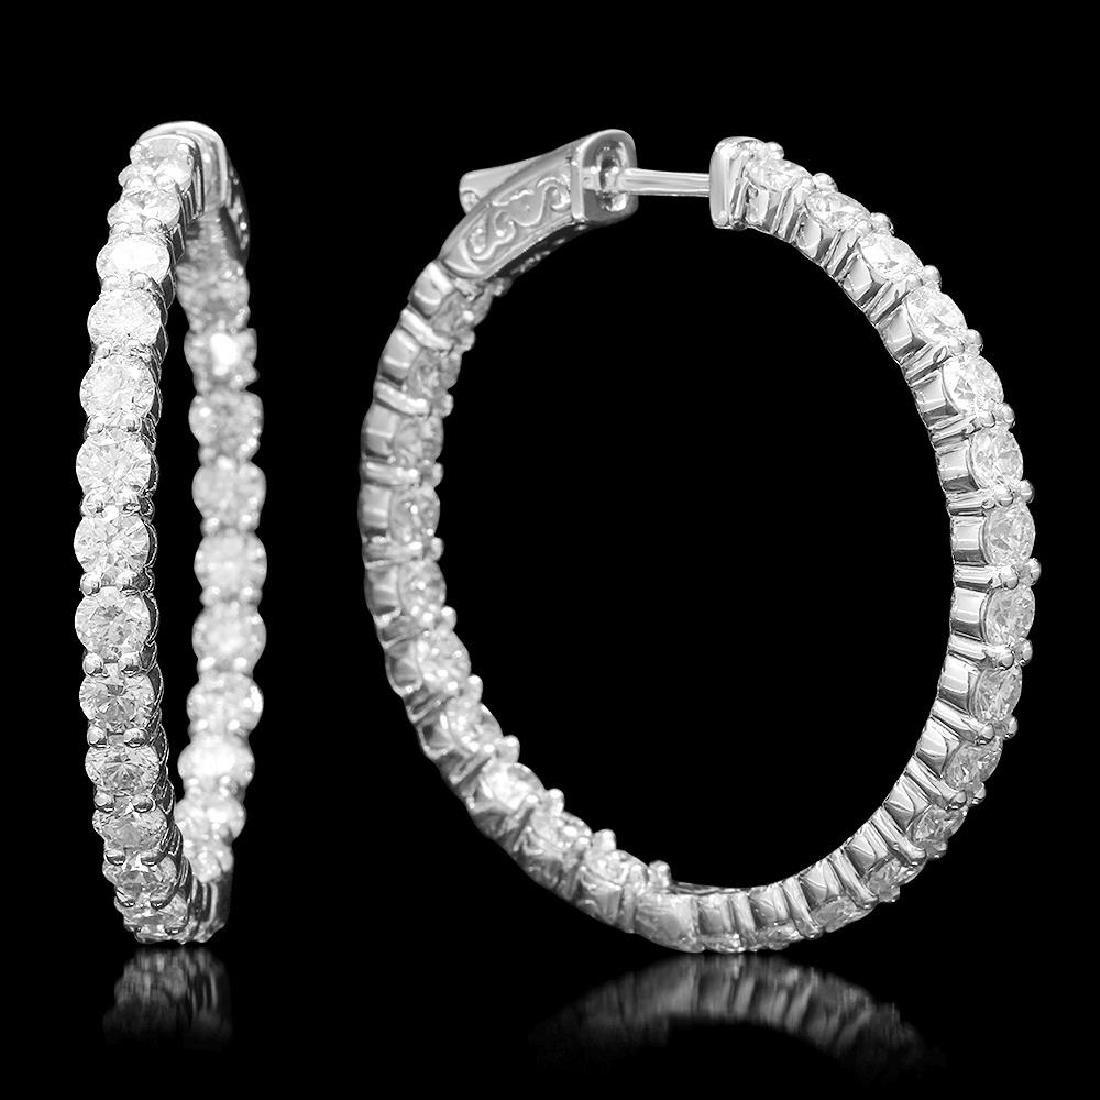 14K Gold 5.31ct Diamond Earrings